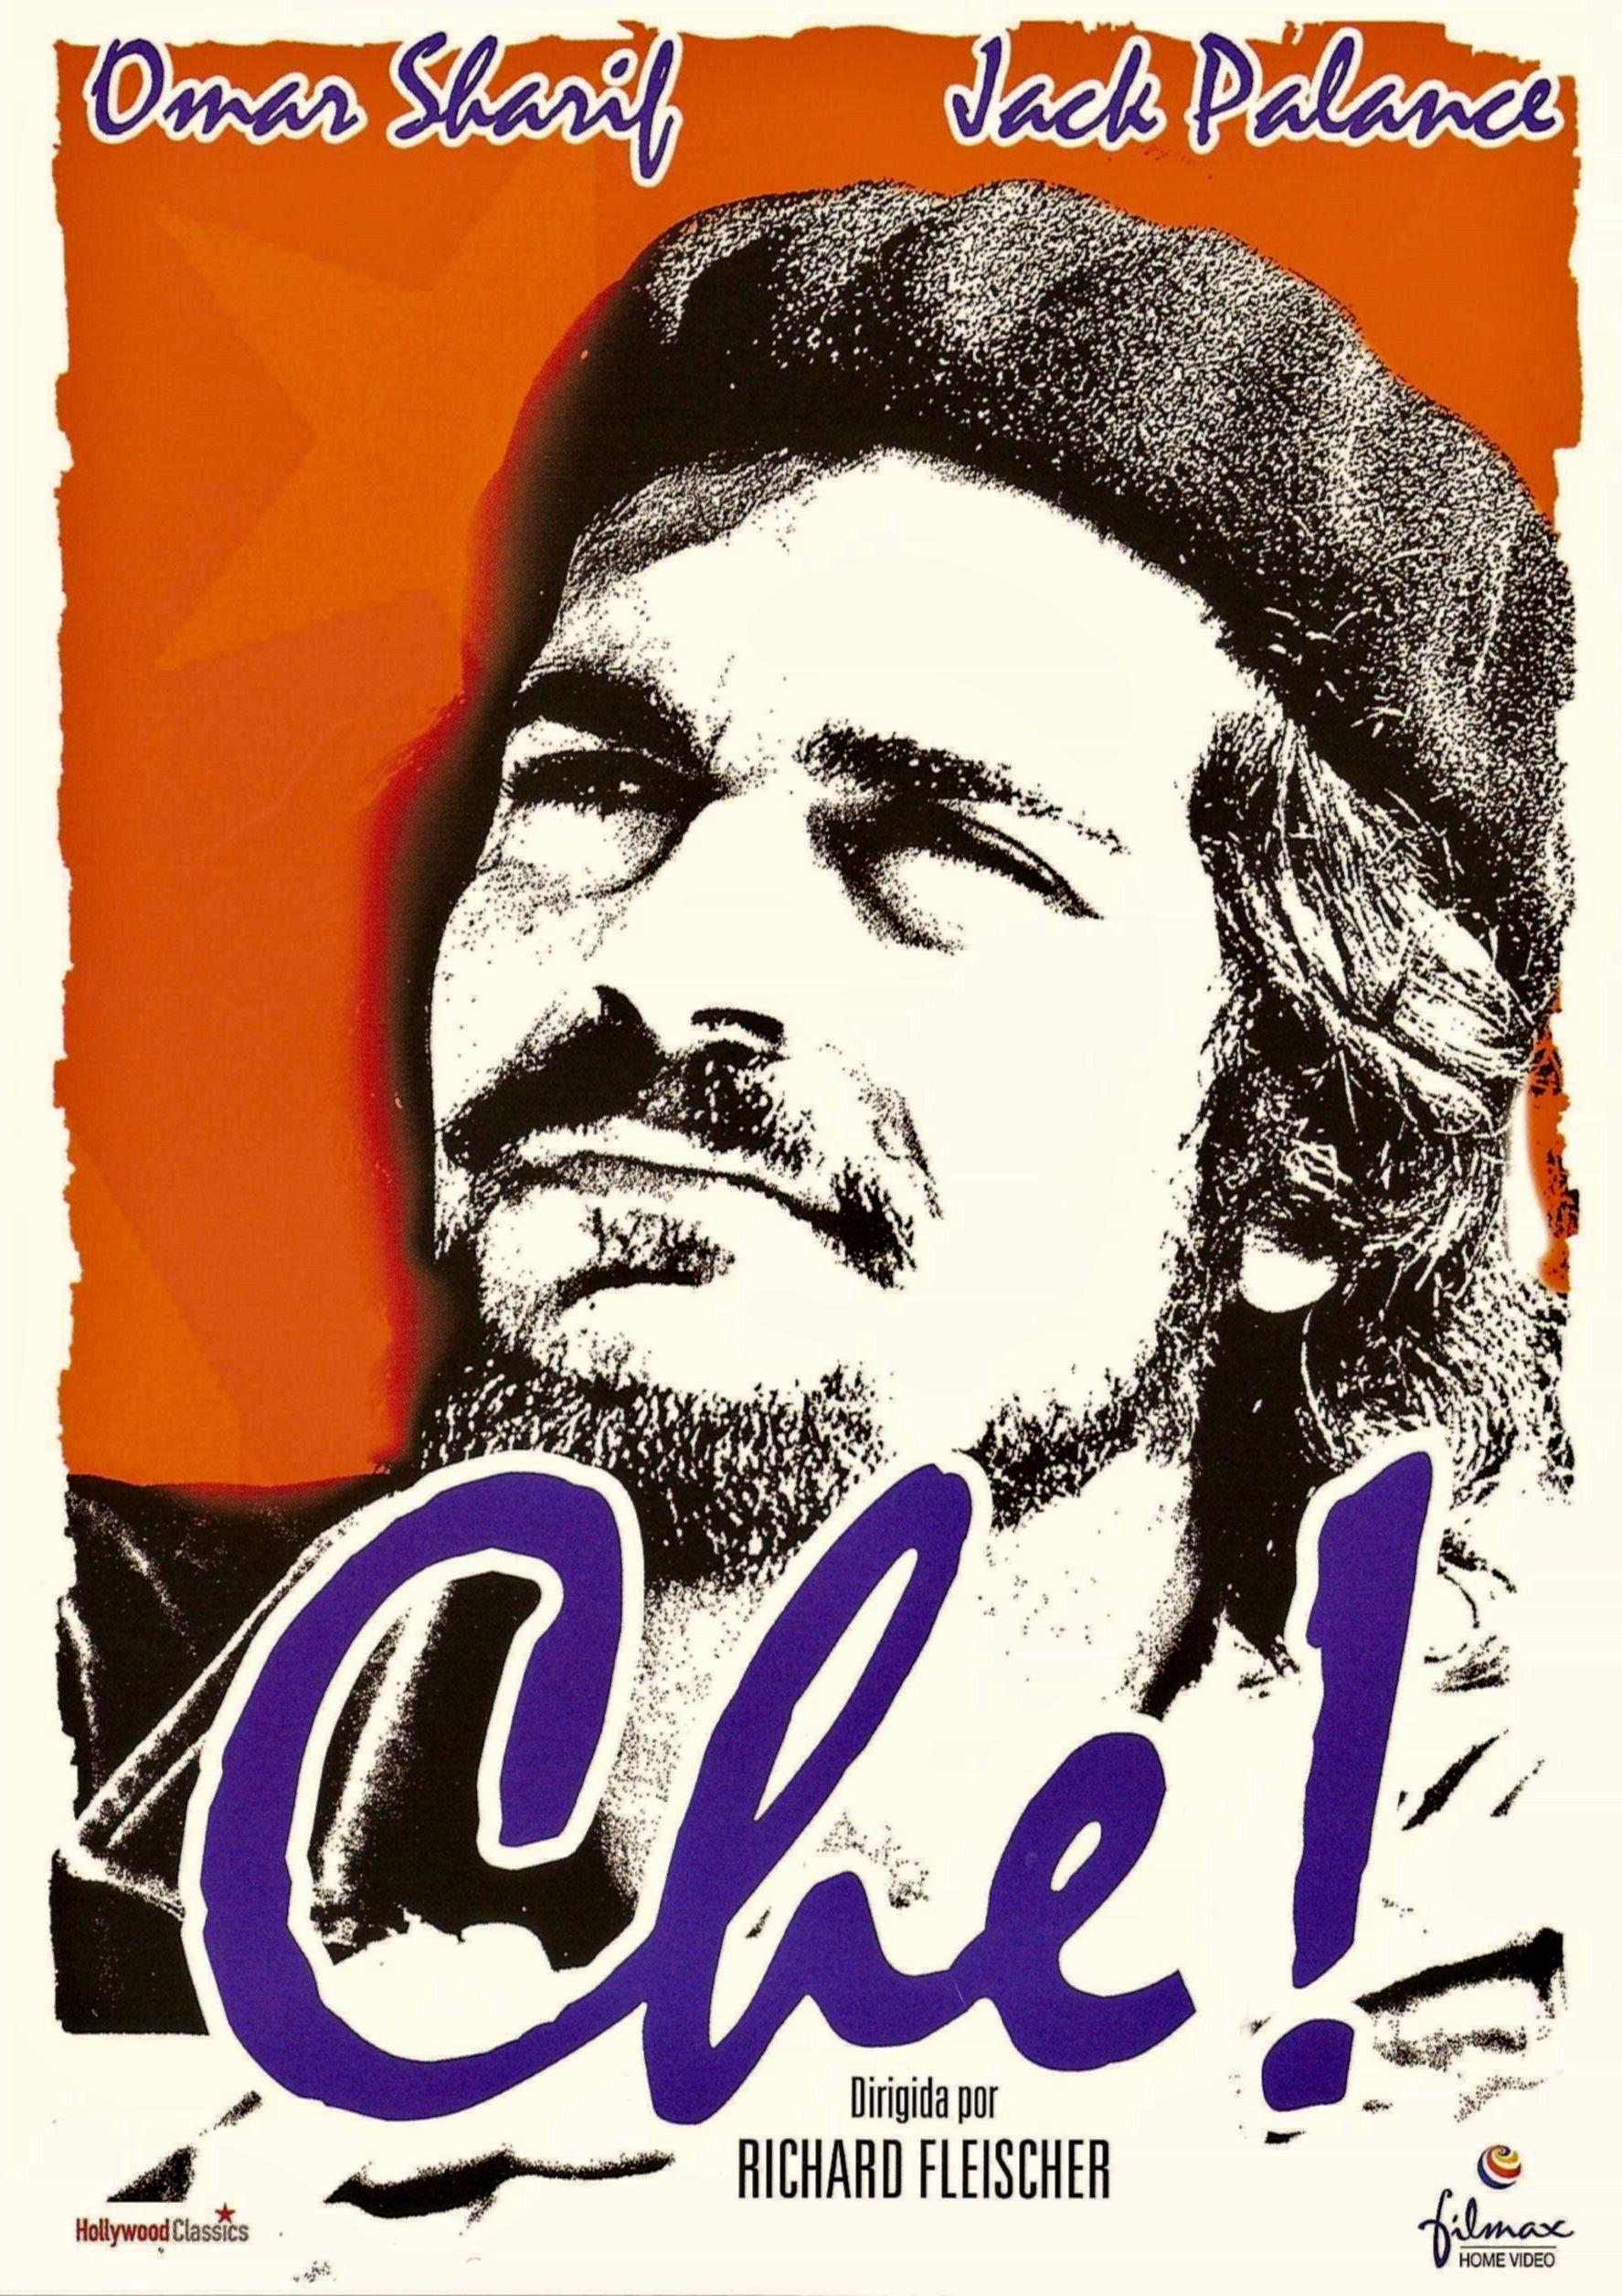 Che 1969 De Richard Fleischer Tt0064158 Cine Cinematografico Peliculas